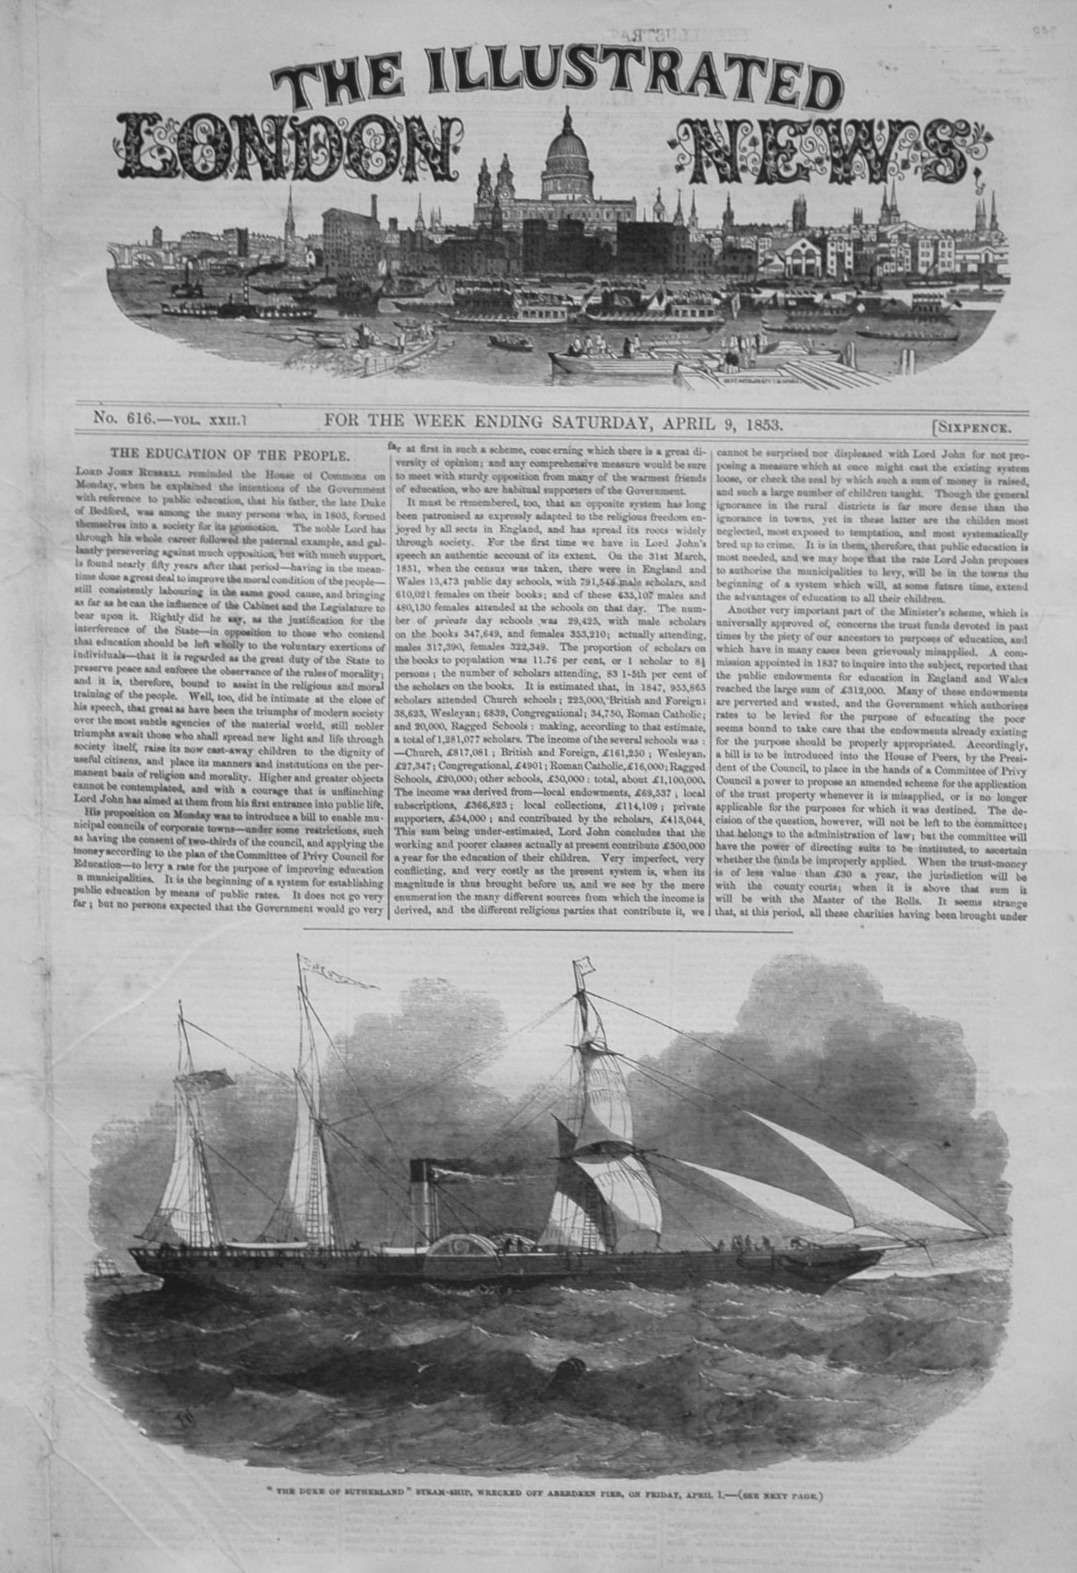 Illustrated London News, April 9th 1853.